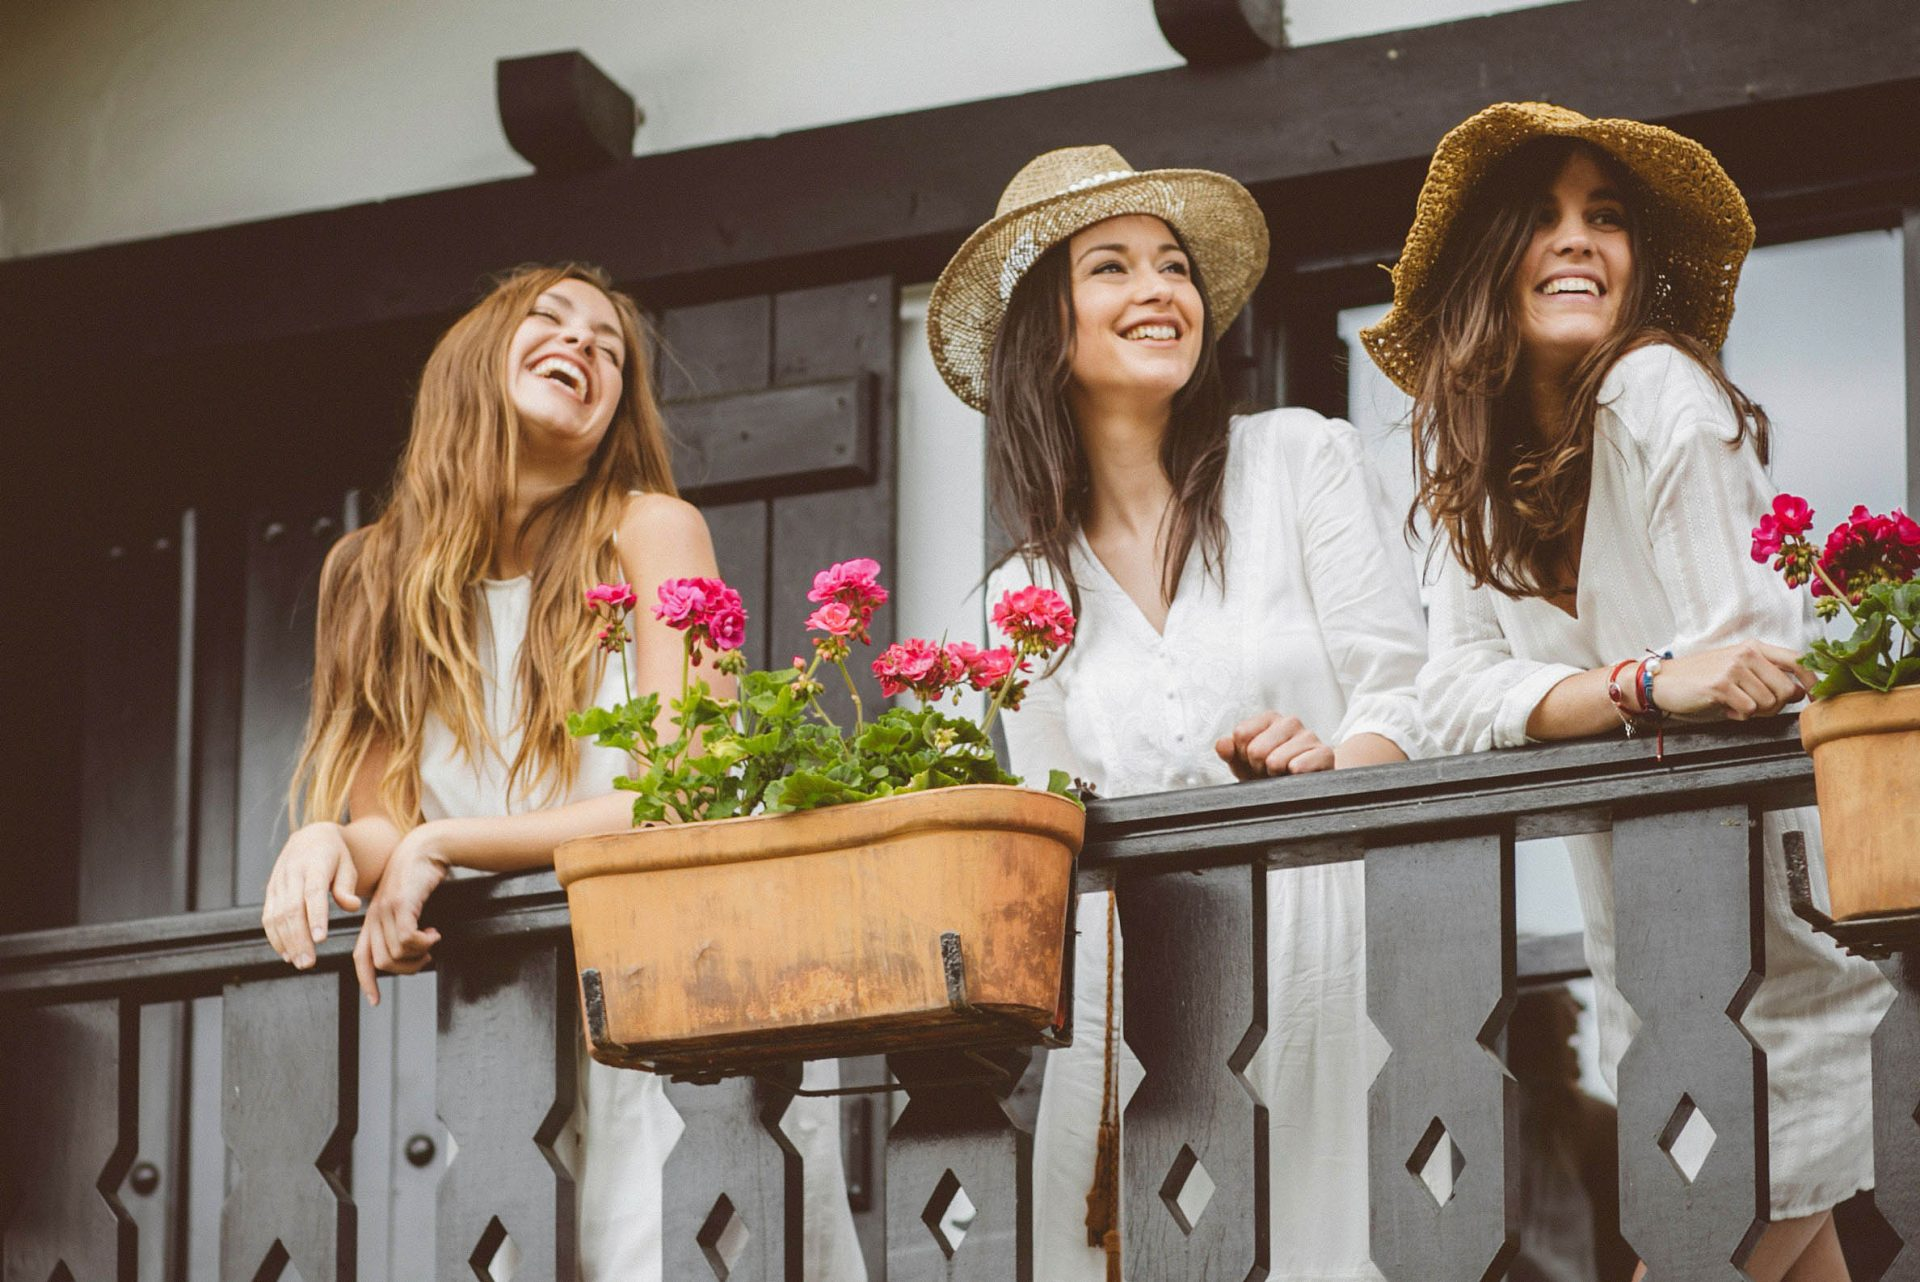 chicas felices con vestido blanco en un balcón